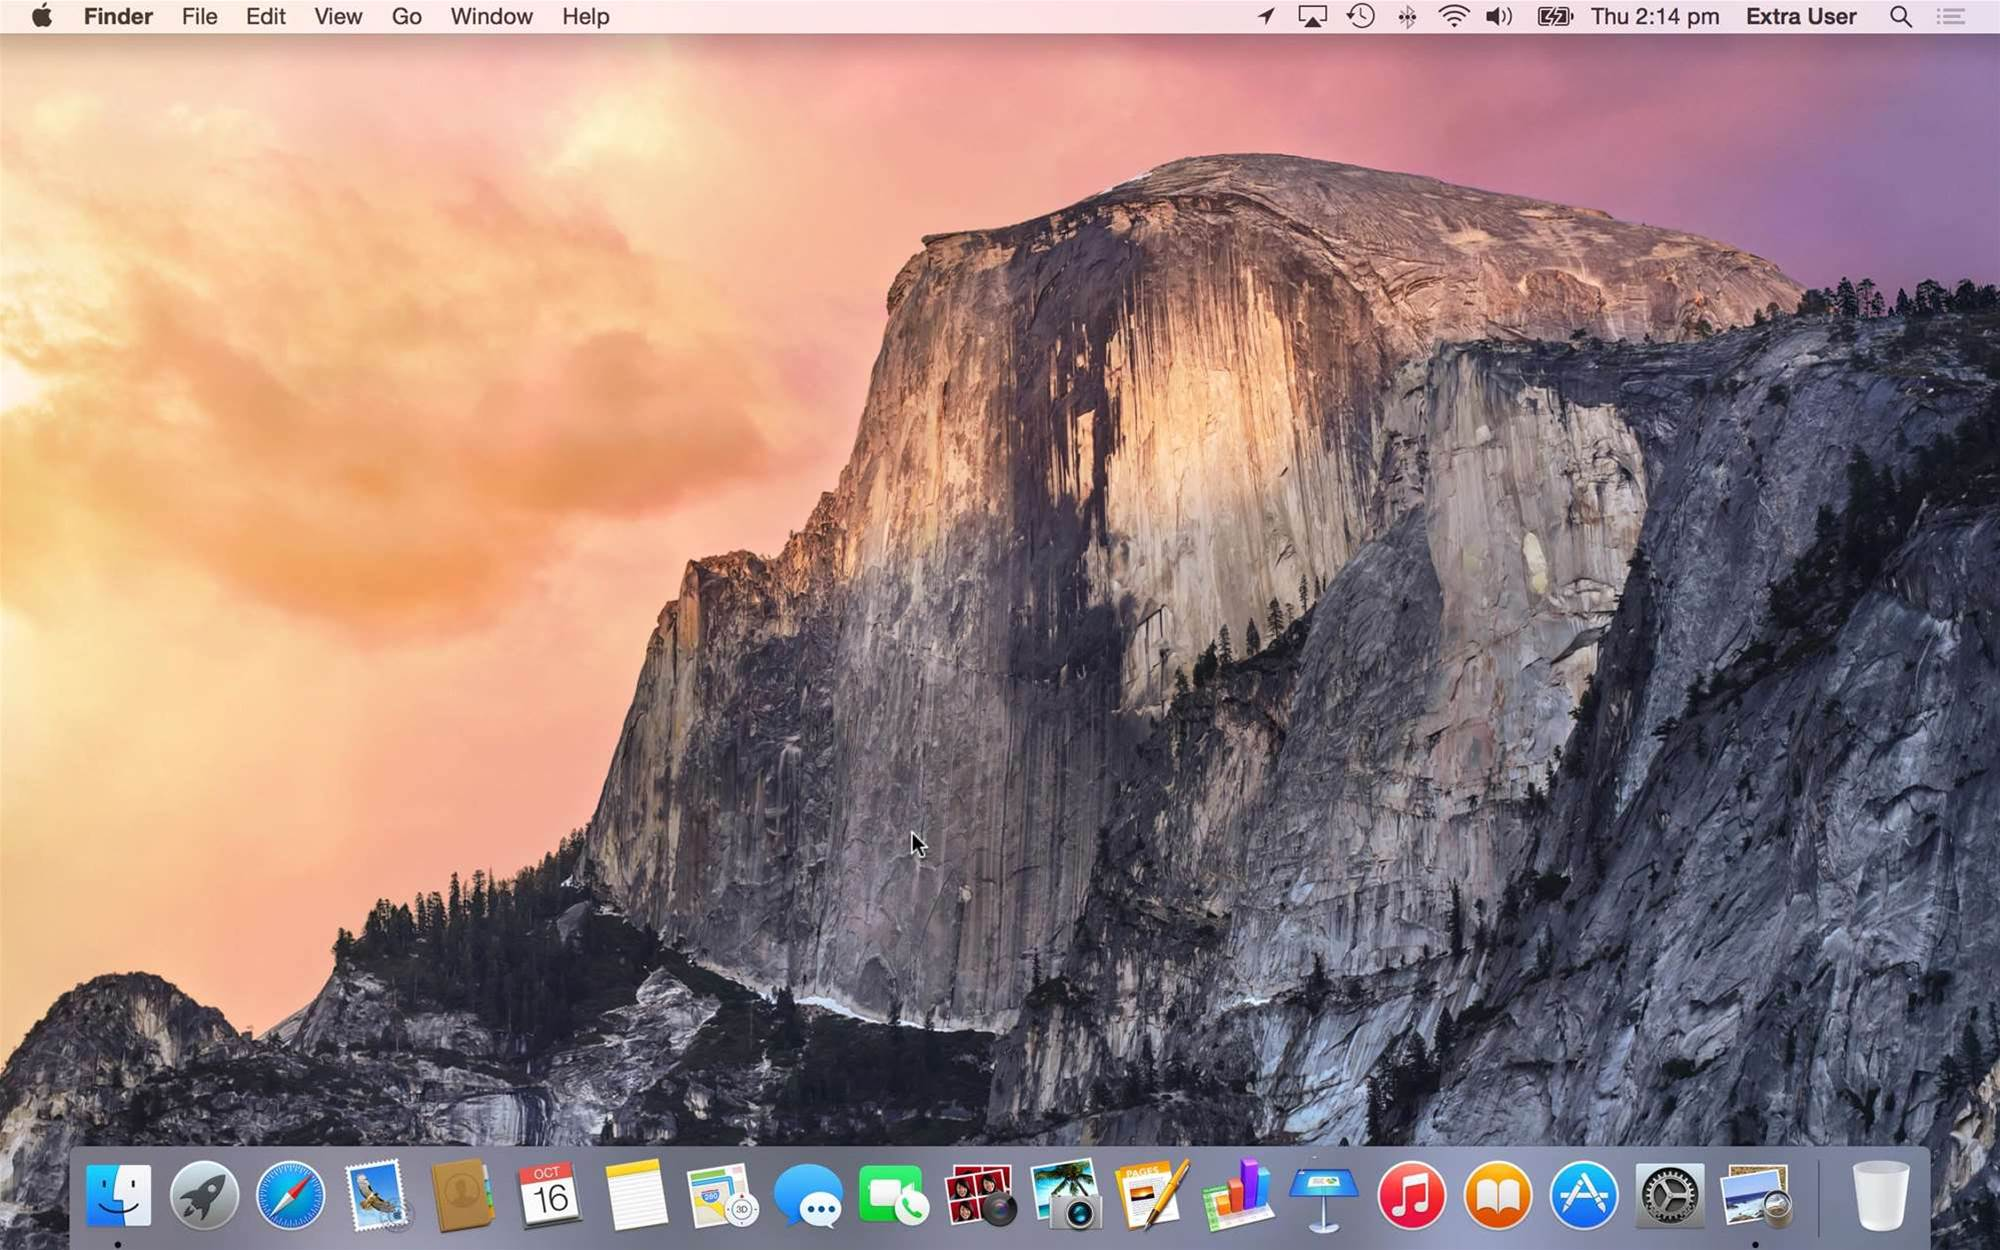 Reviewed: Mac OS X Yosemite